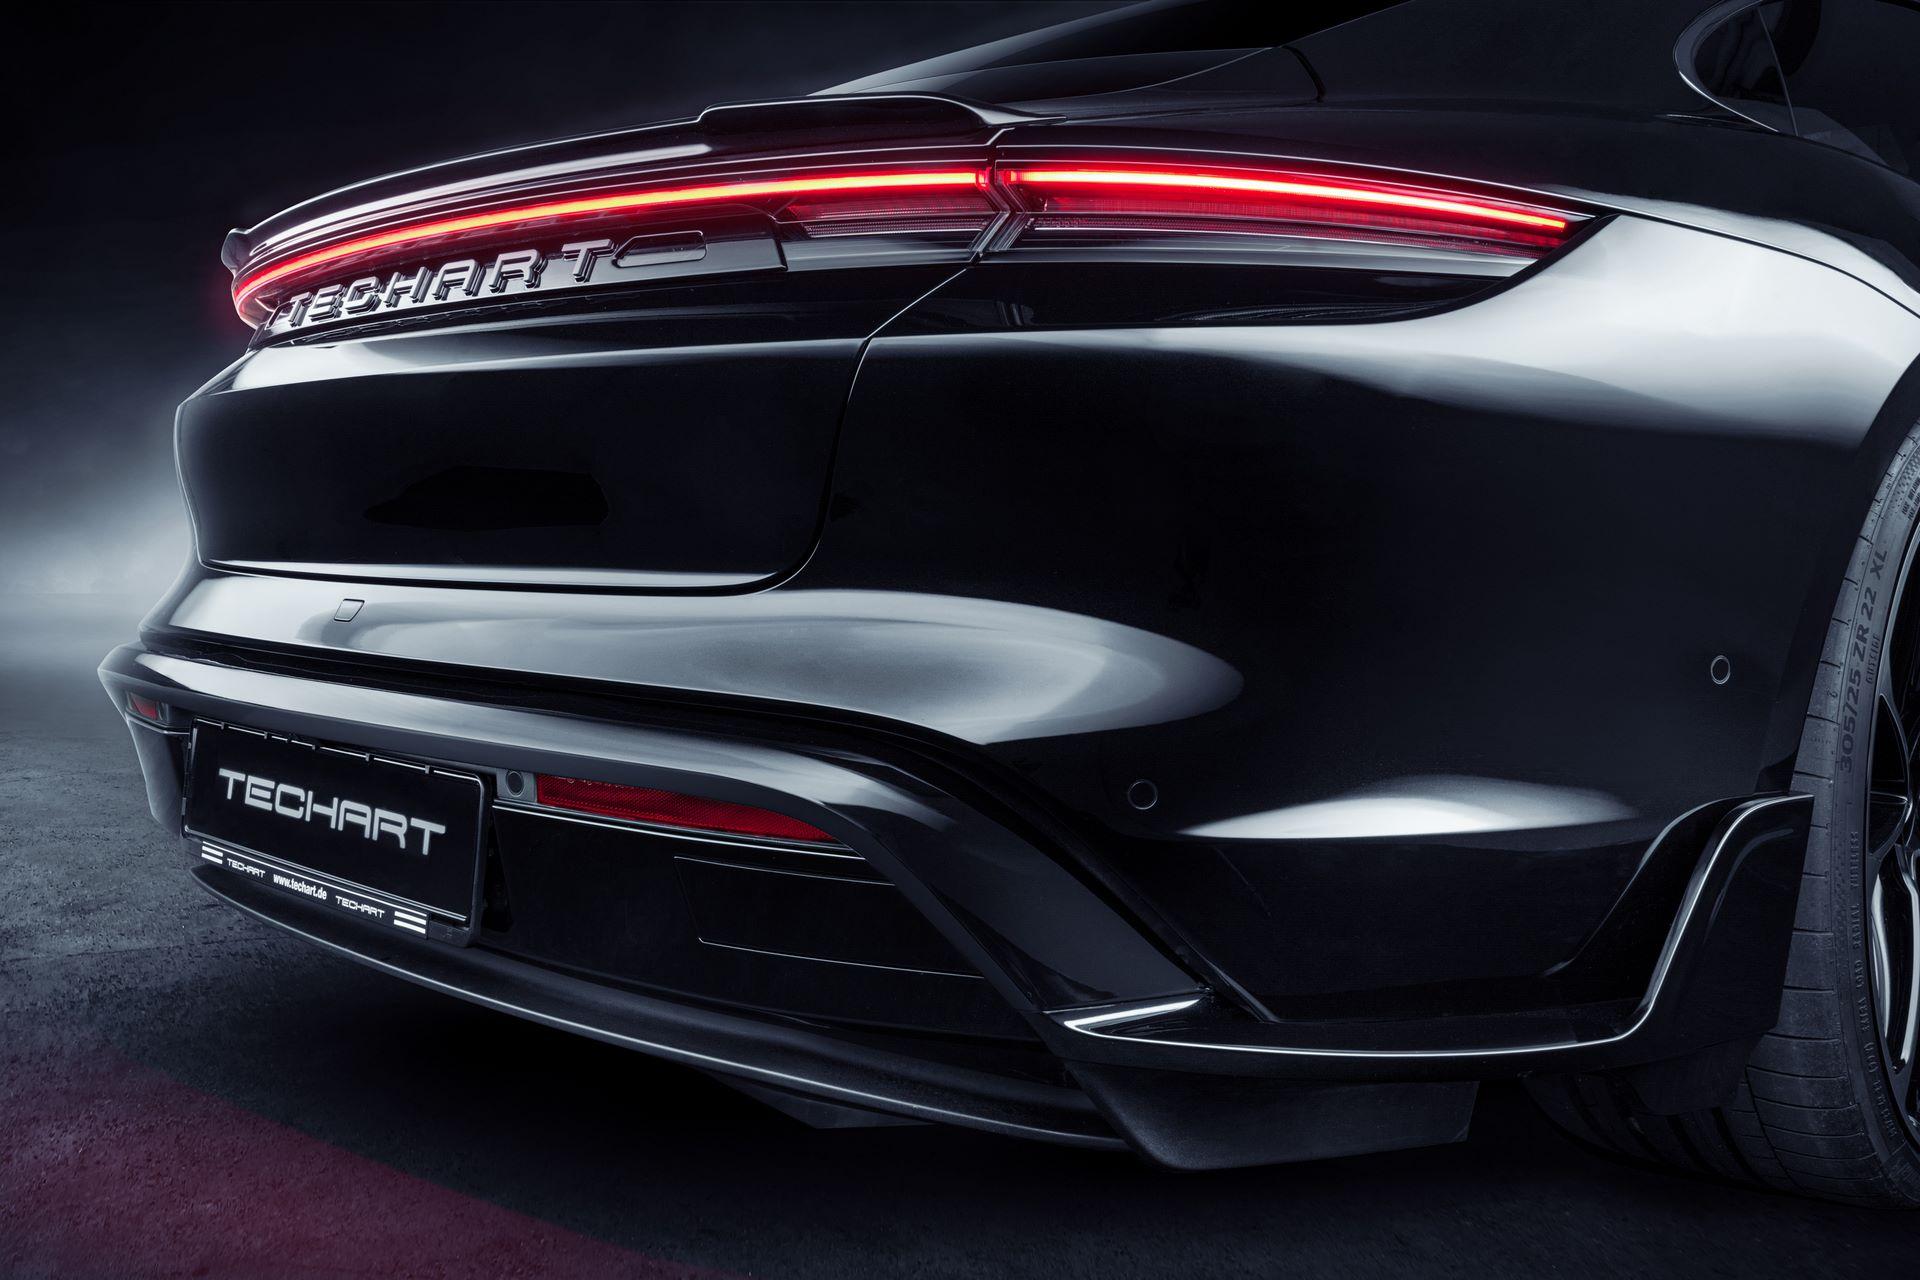 Porsche-Taycan-bodykit-by-TechArt-24